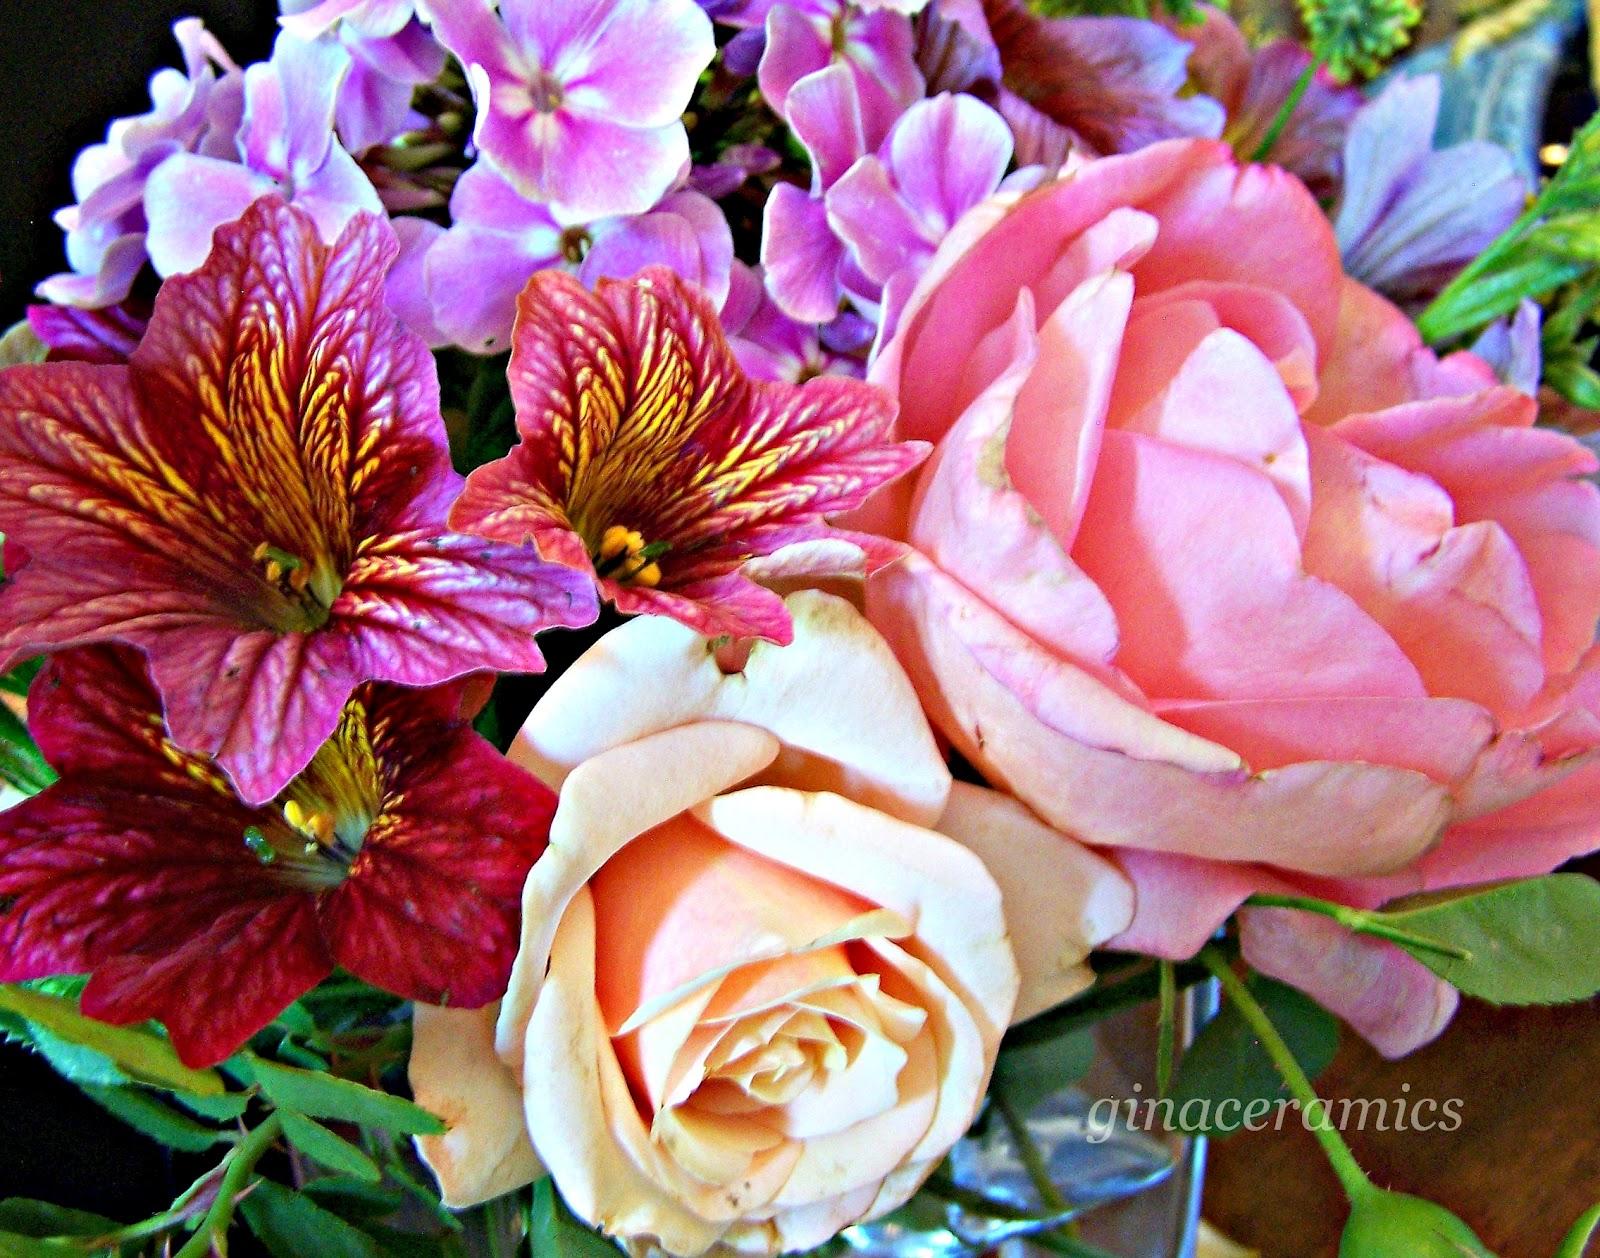 You May Want To Add The Following: Lavender Flowers, Rose Geranium Leaves,  Essential Oils, Lemon Peel, Orange Peel, Powdered Orris Root